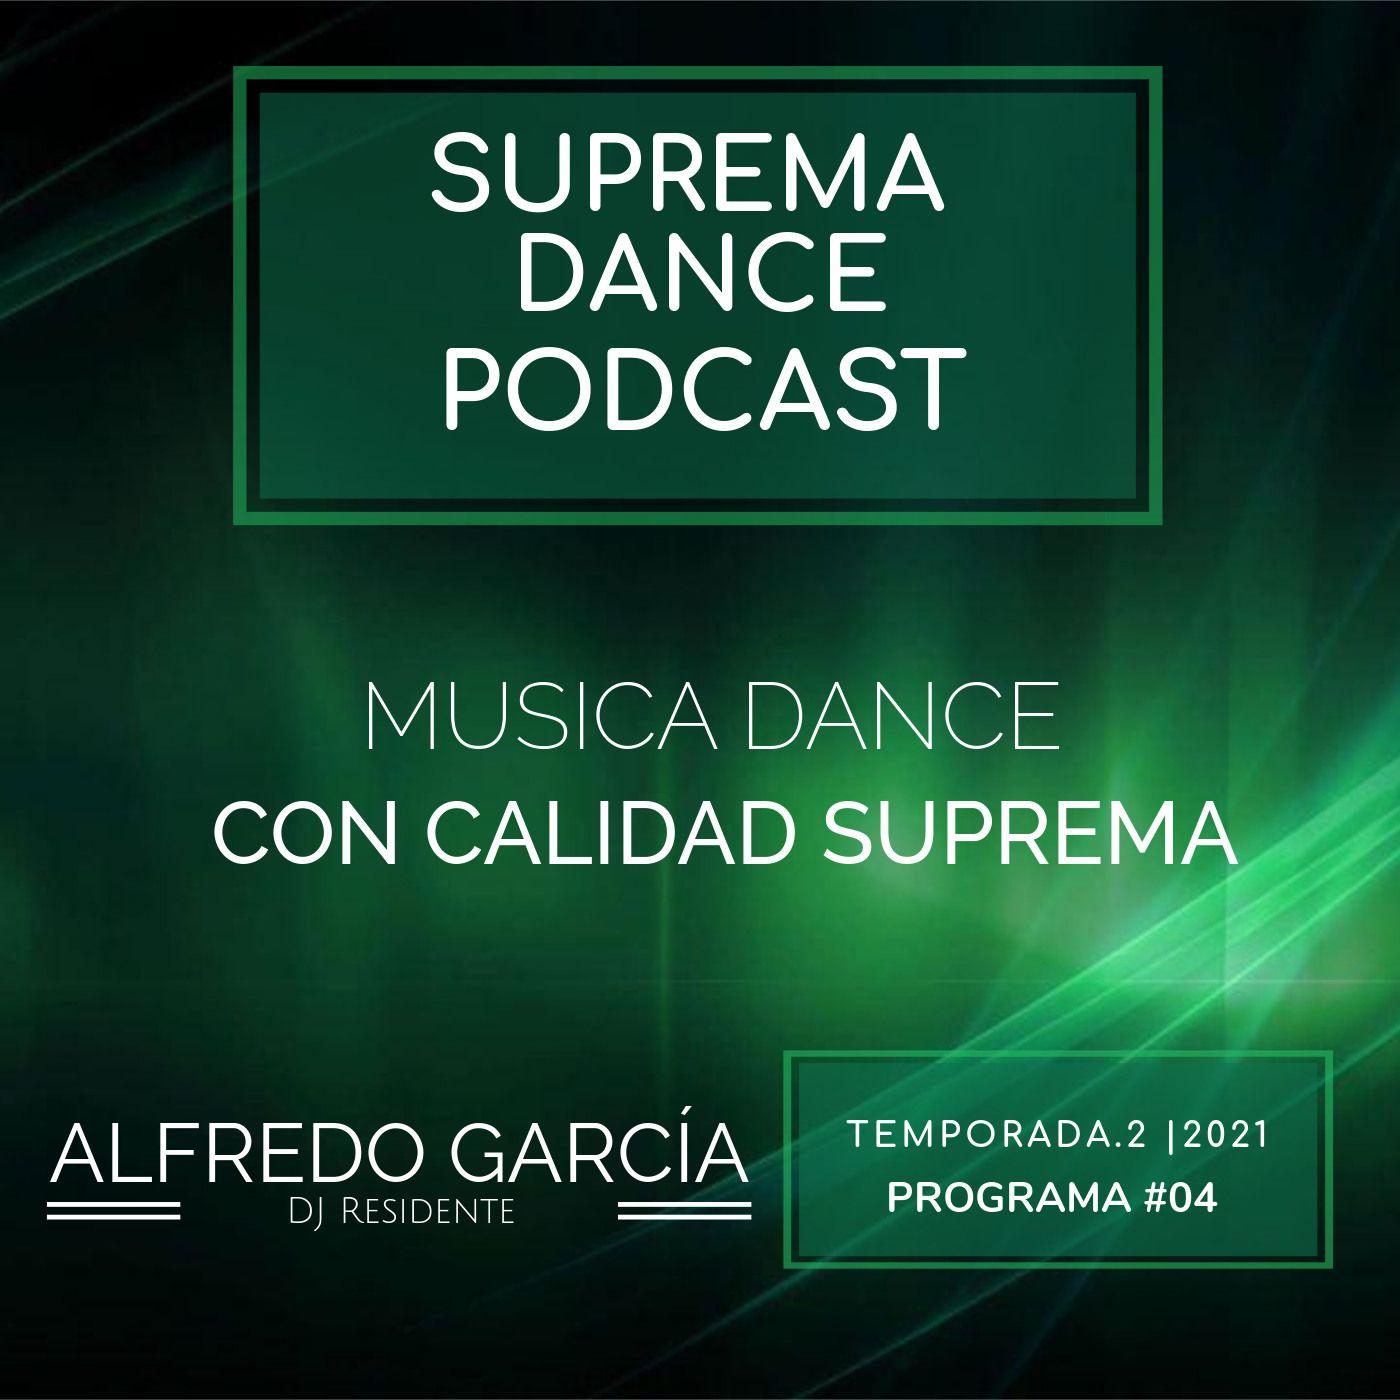 DJ Residente Alfredo García | Programa-4 | T.2 | SDP